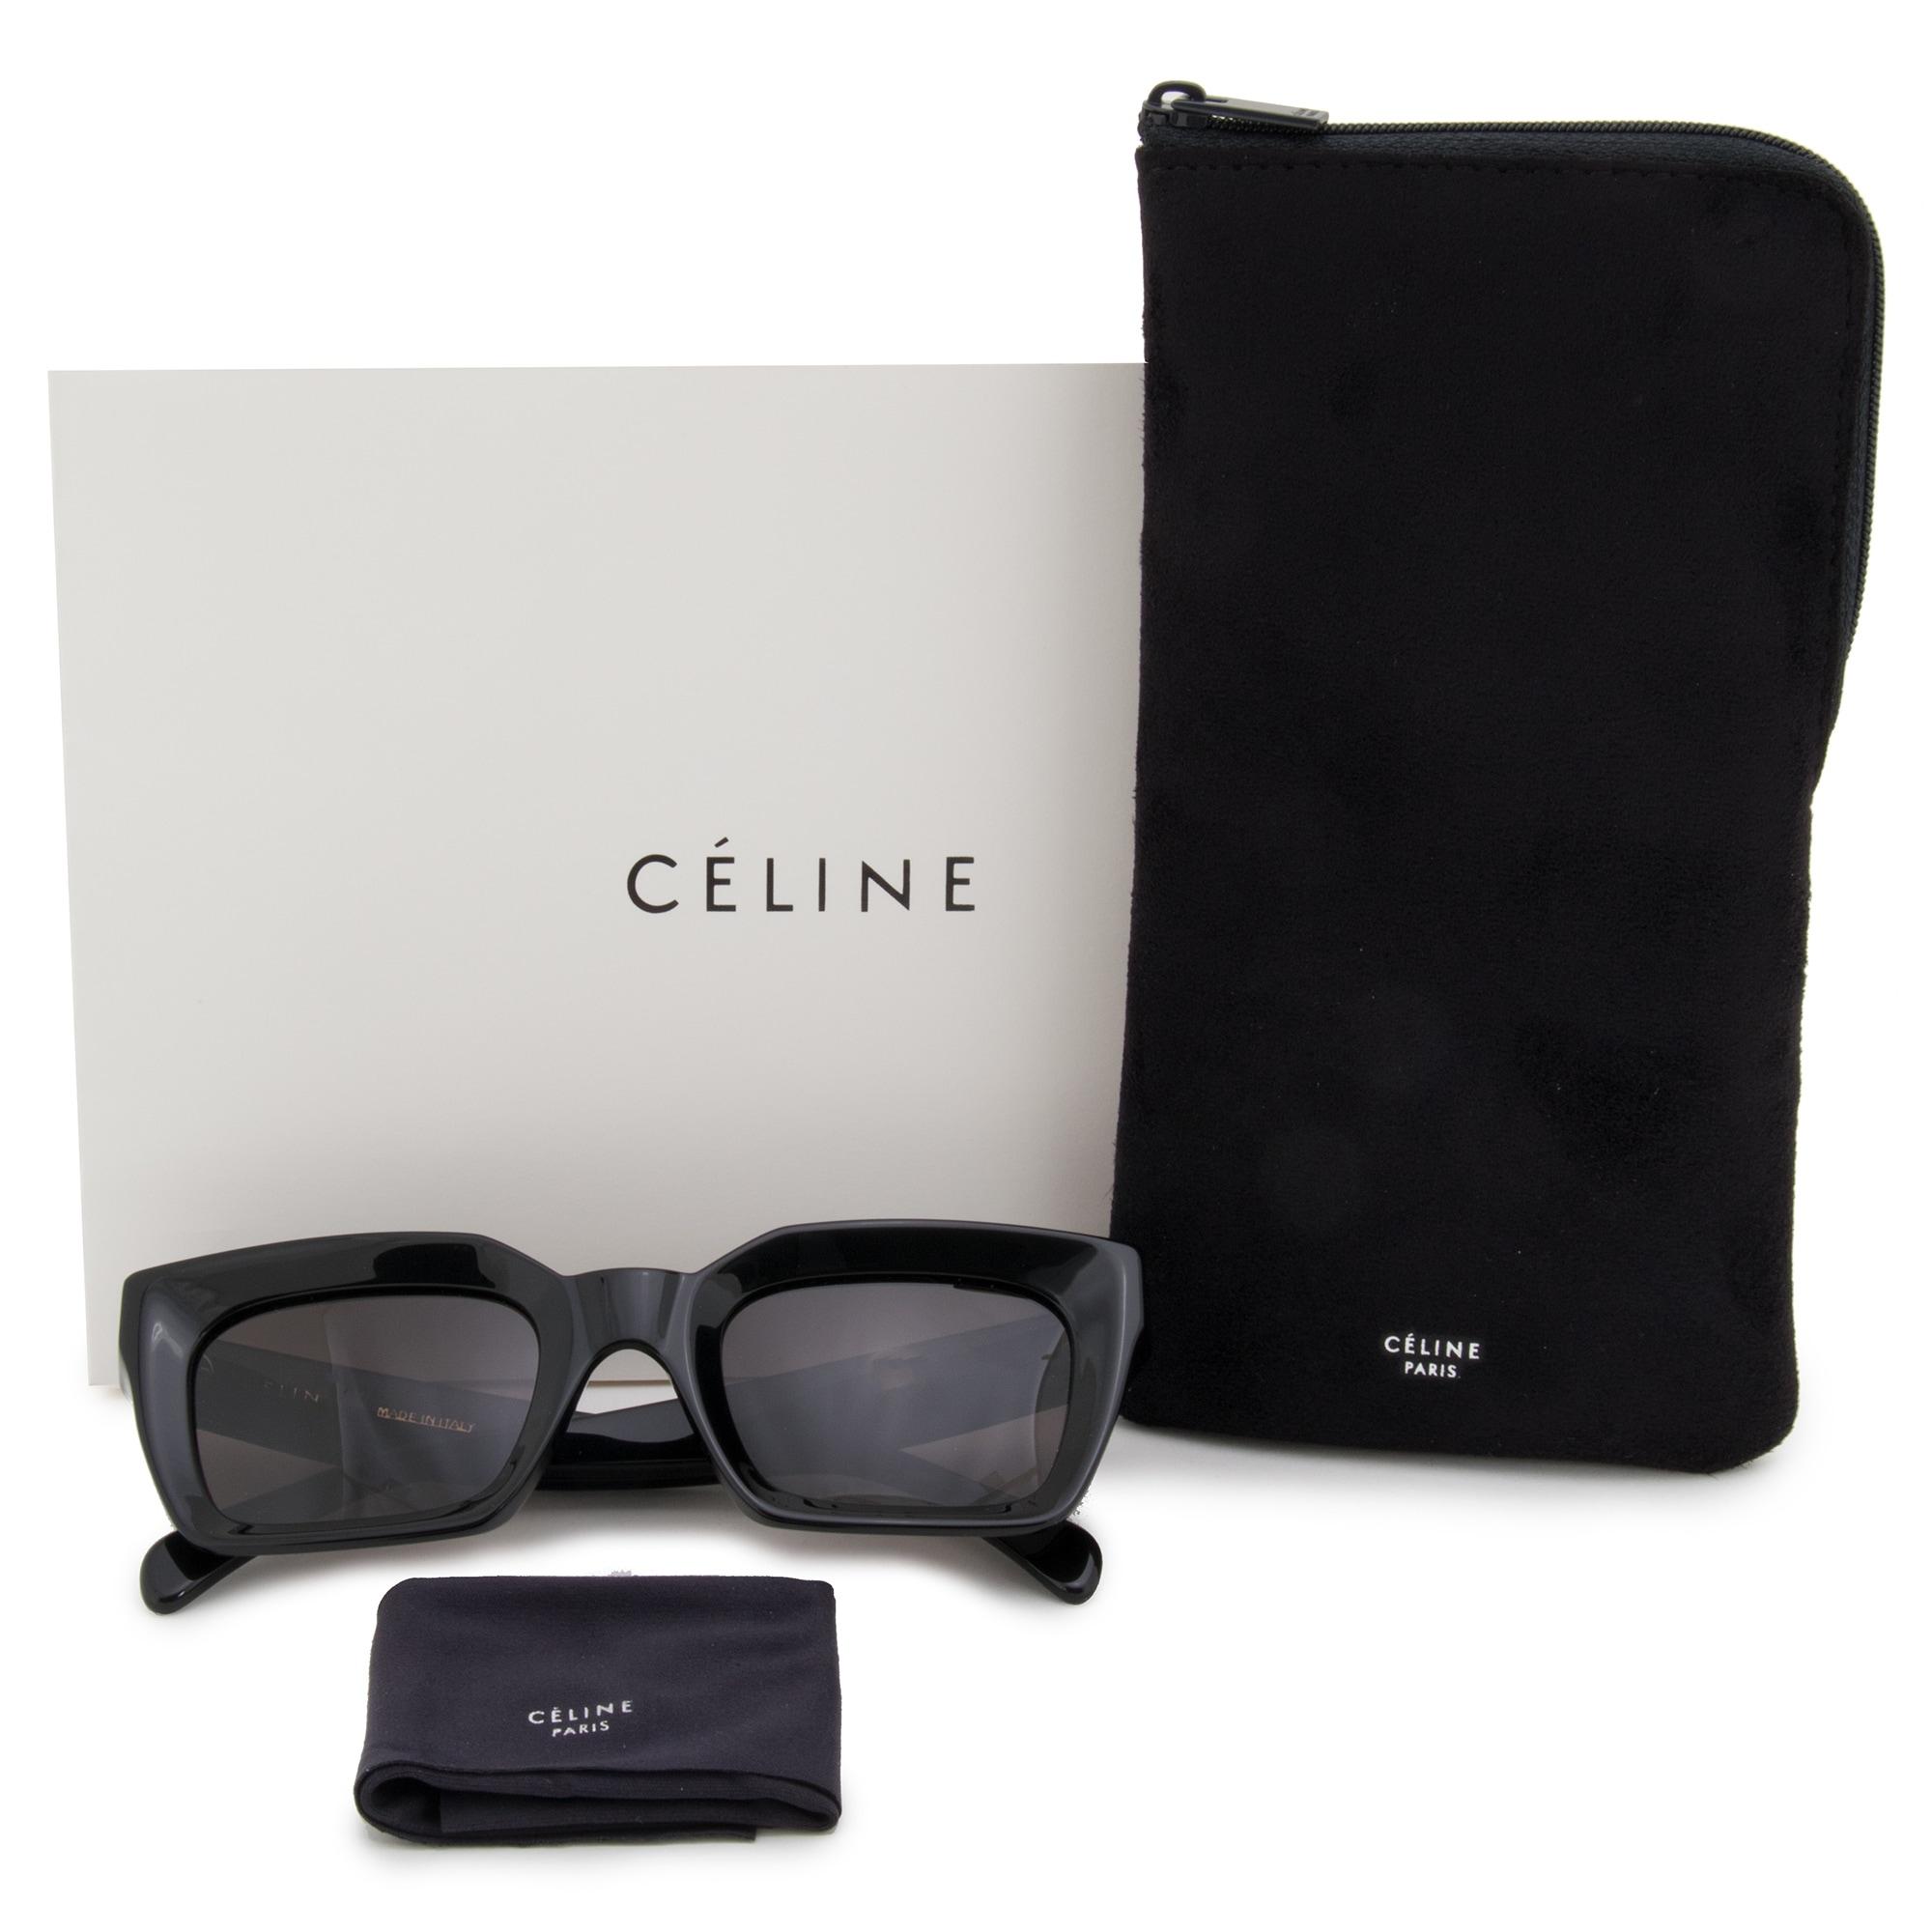 c12779211e5 Shop Celine Wayfarer Sunglasses 41450 S 807 70 50 - Free Shipping Today -  Overstock - 23138902